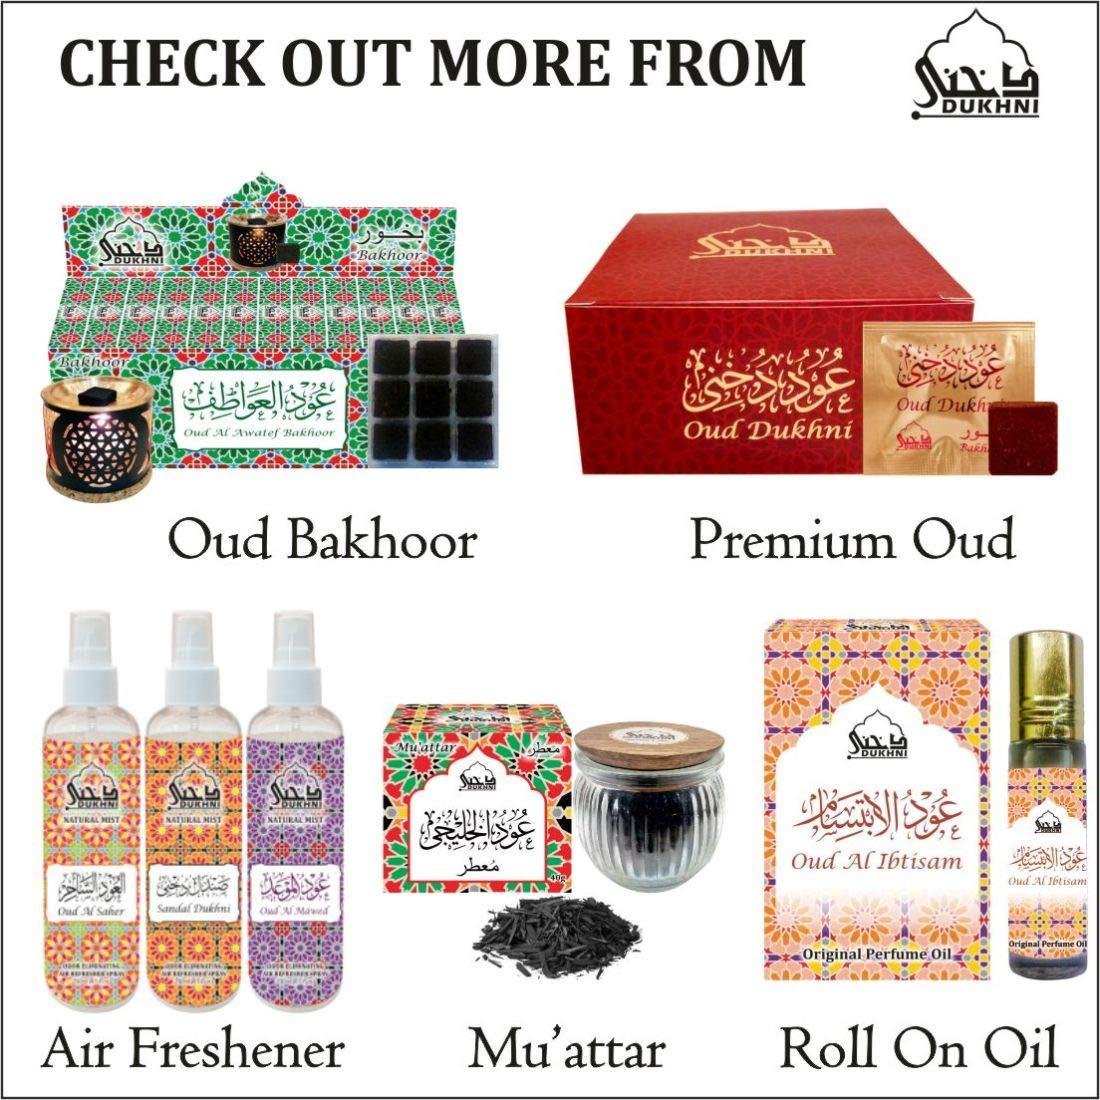 Dukhni Oud Bakhoor Incense Variety Box & Rainbow Bakhoor Burner - Gift Set & Starter Kit by Dukhni (Image #2)